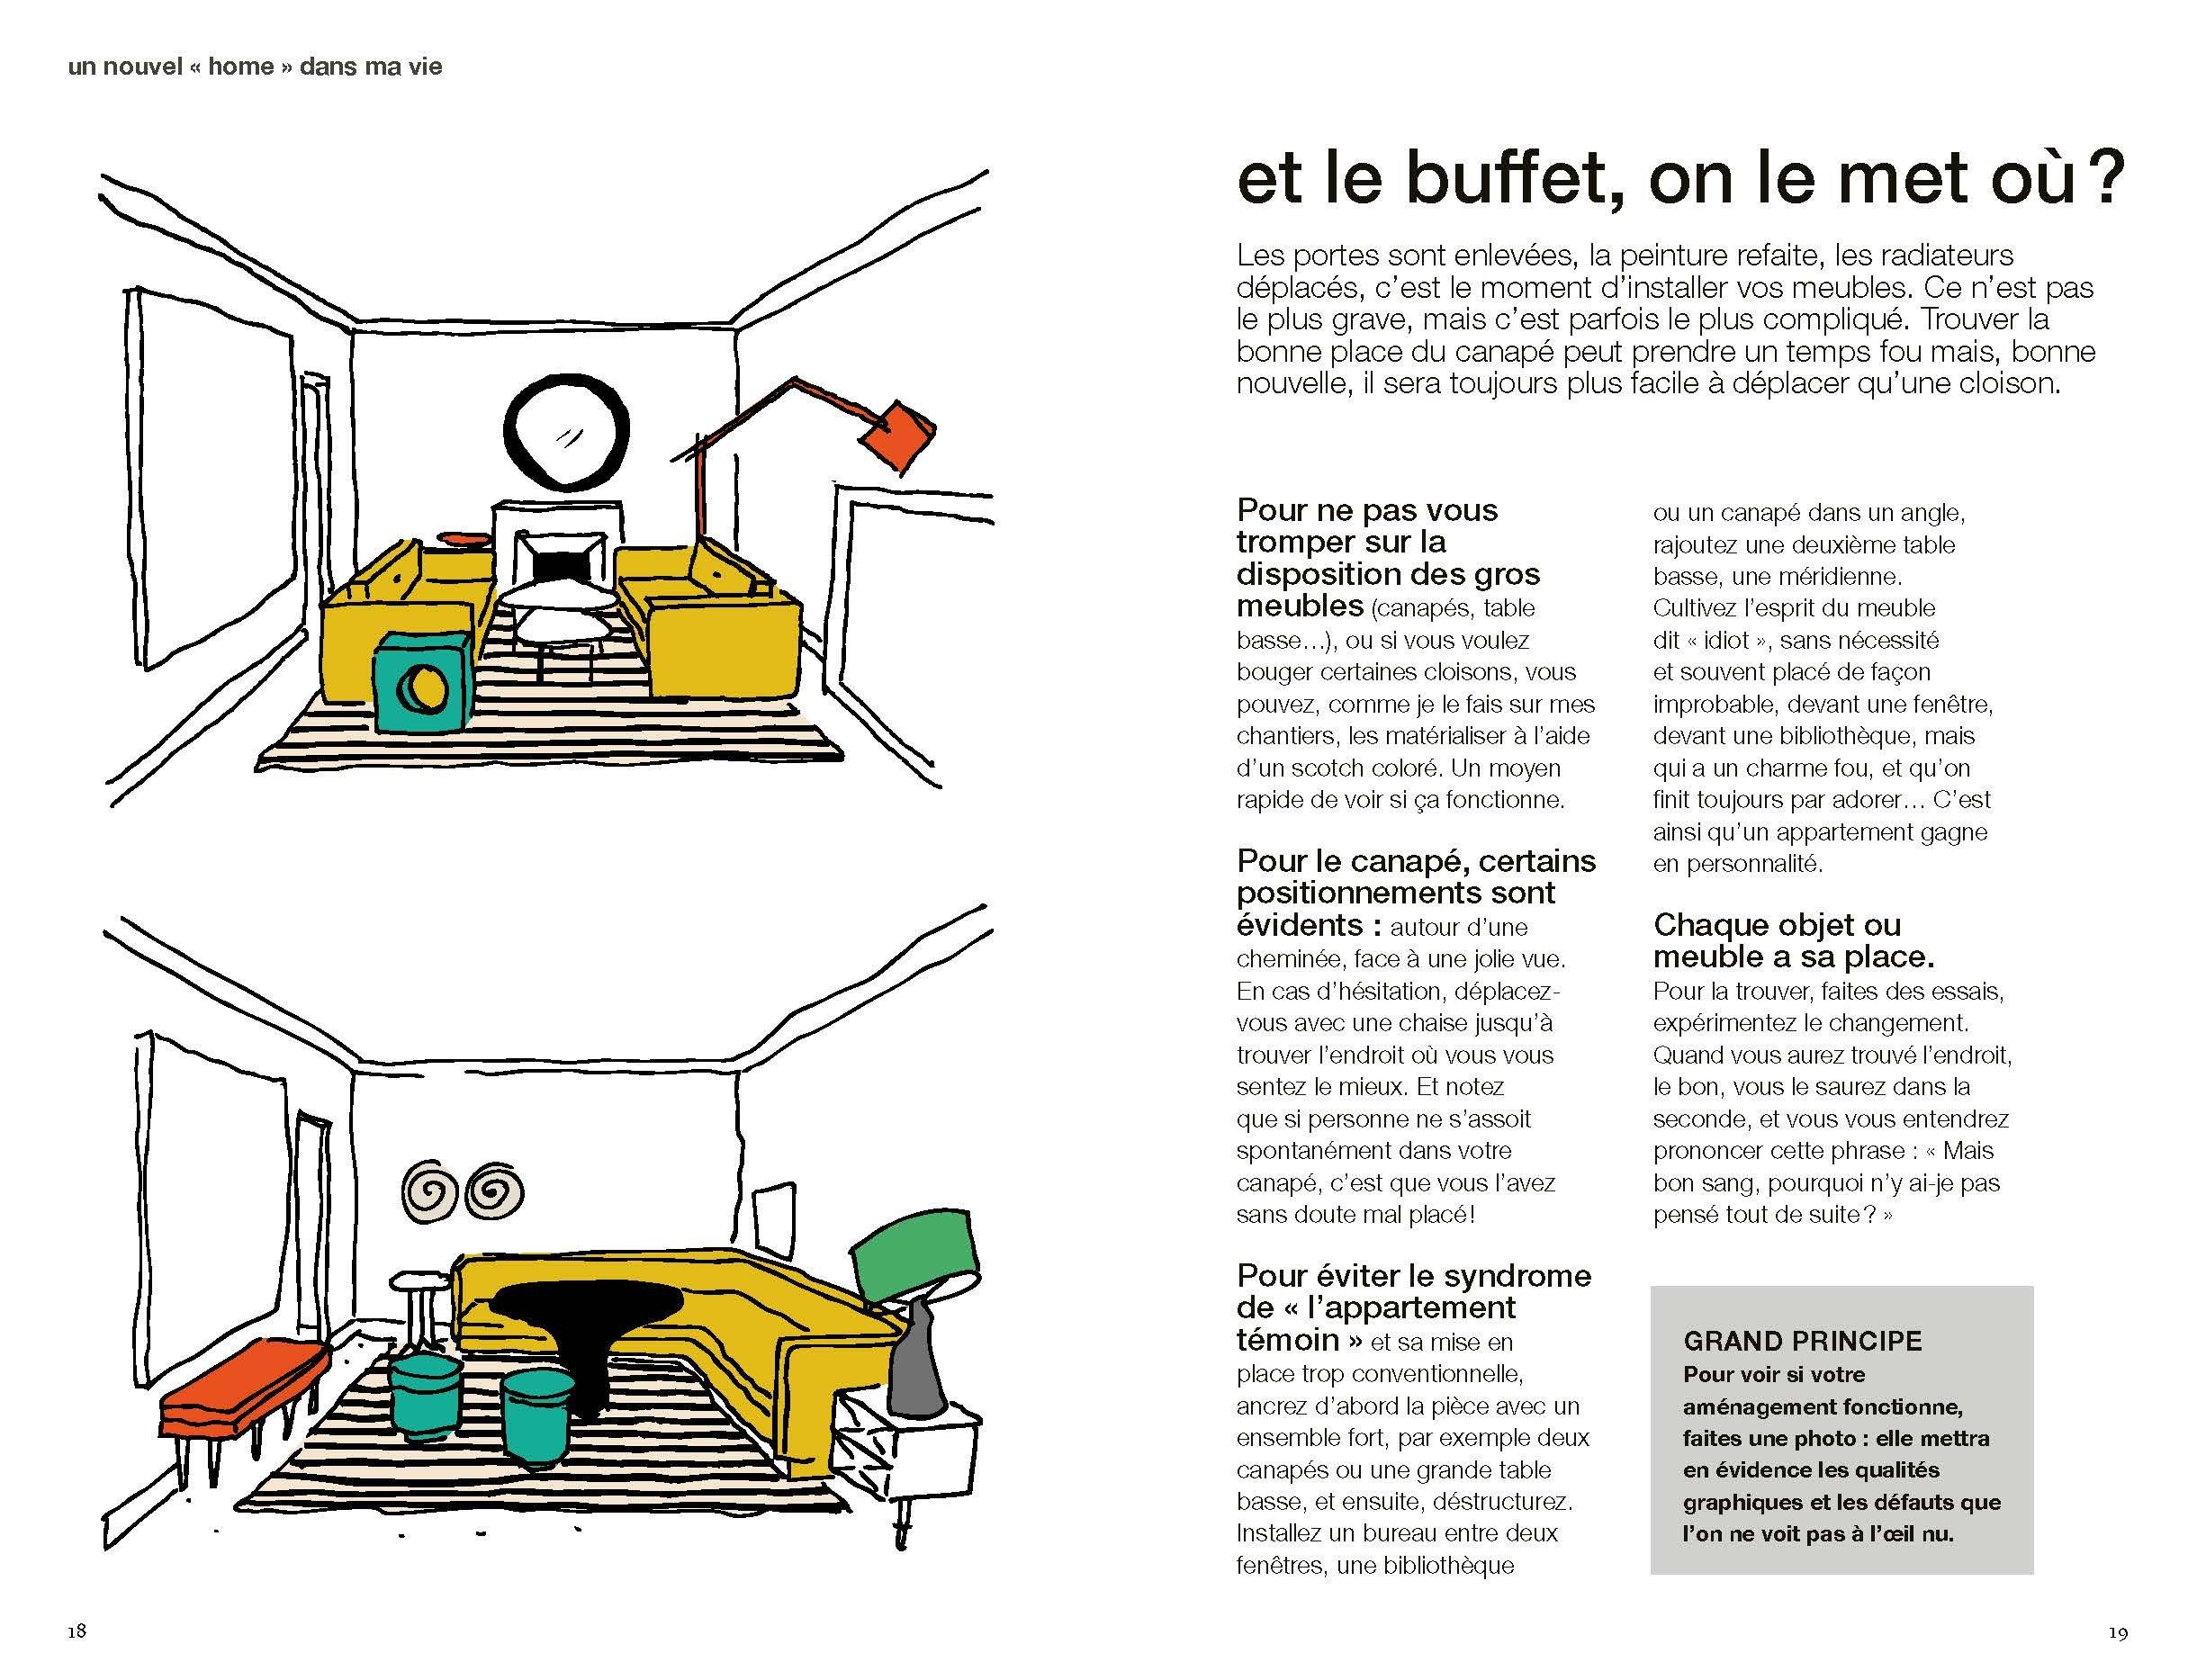 meuble devant radiateur best radiateur jaune with meuble devant radiateur amusezvous repeindre. Black Bedroom Furniture Sets. Home Design Ideas